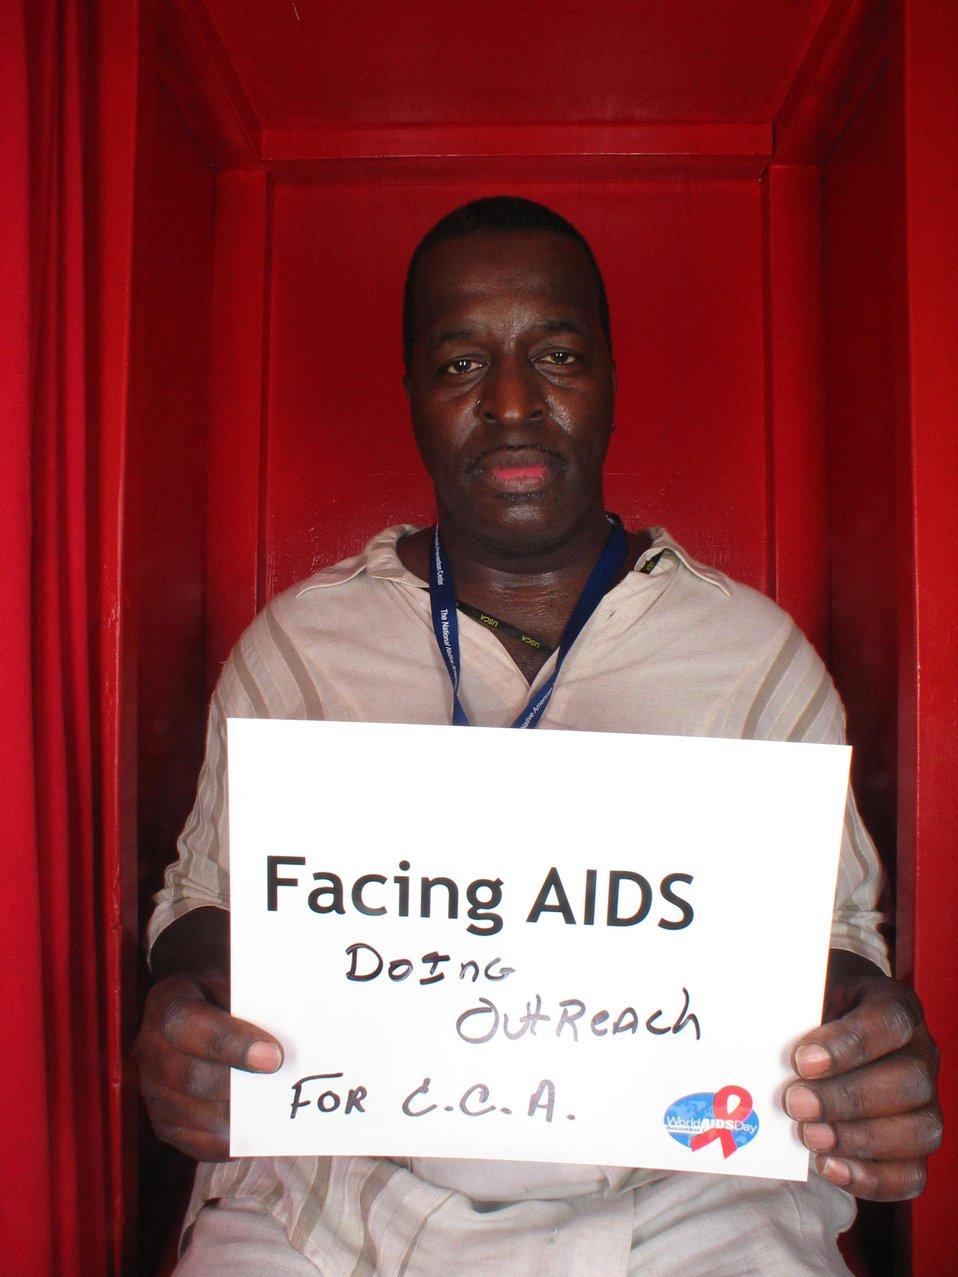 Facing AIDS doing outreach.